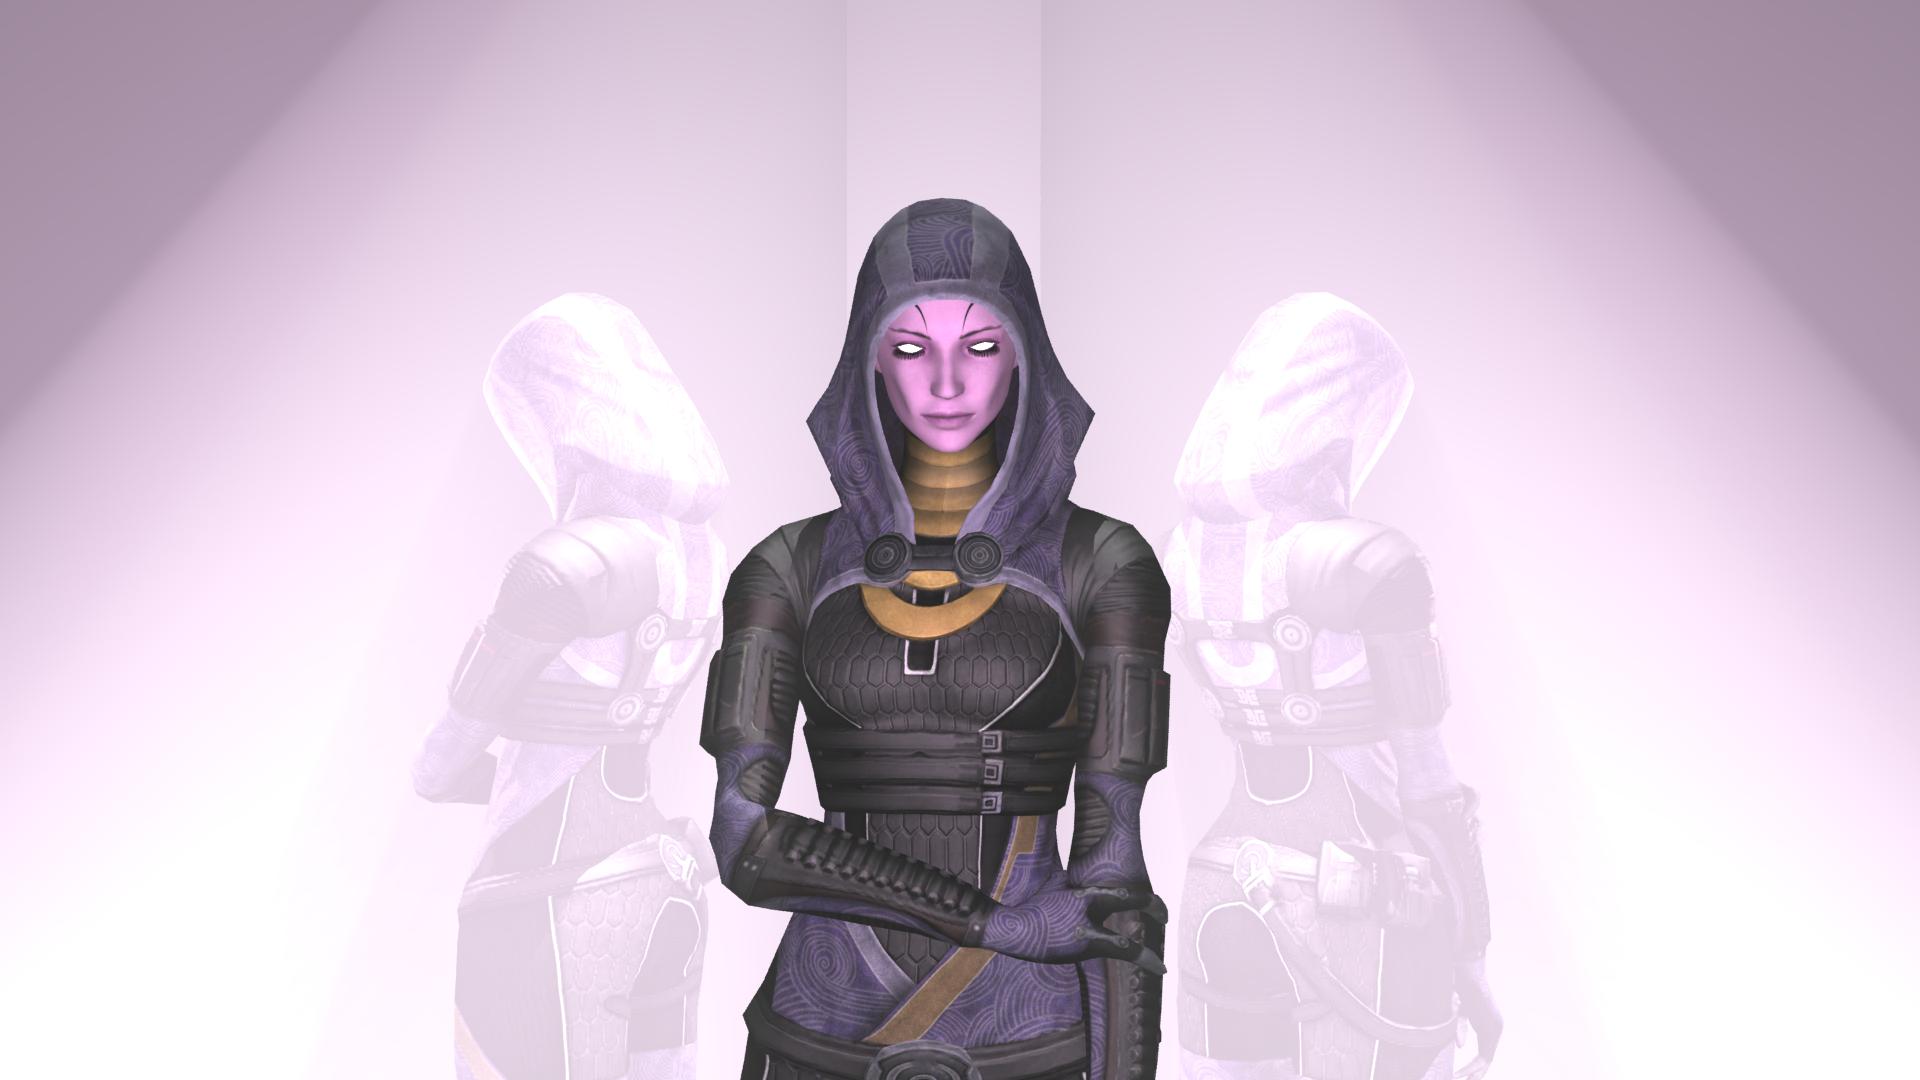 Mass Effect Tali Unmasked Tali unmasked pose 2 (no